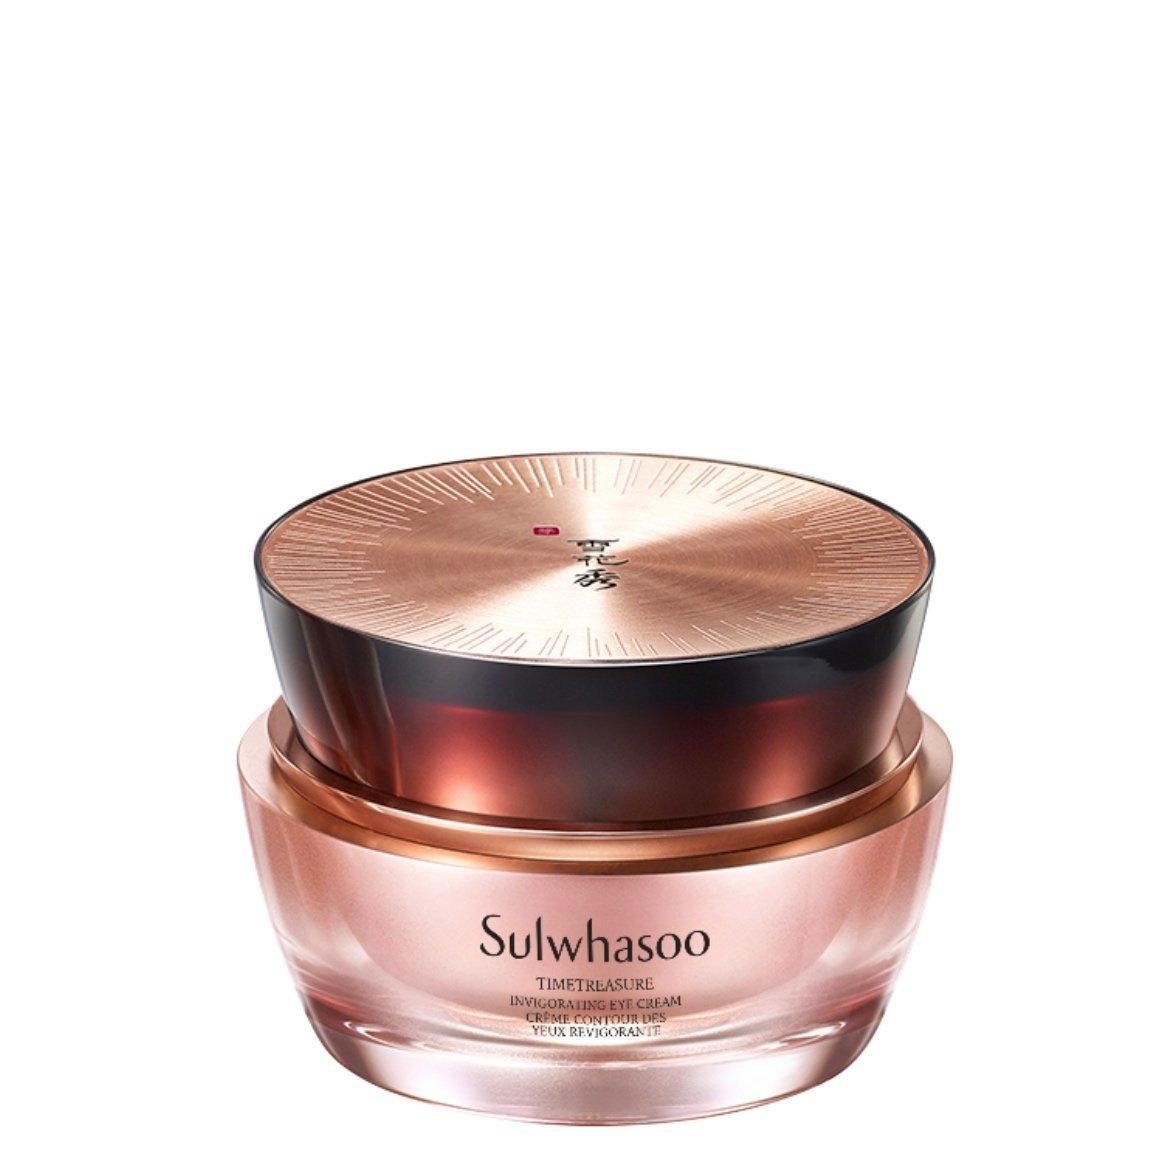 Sulwhasoo Timetreasure Invigorating Eye Cream product swatch.